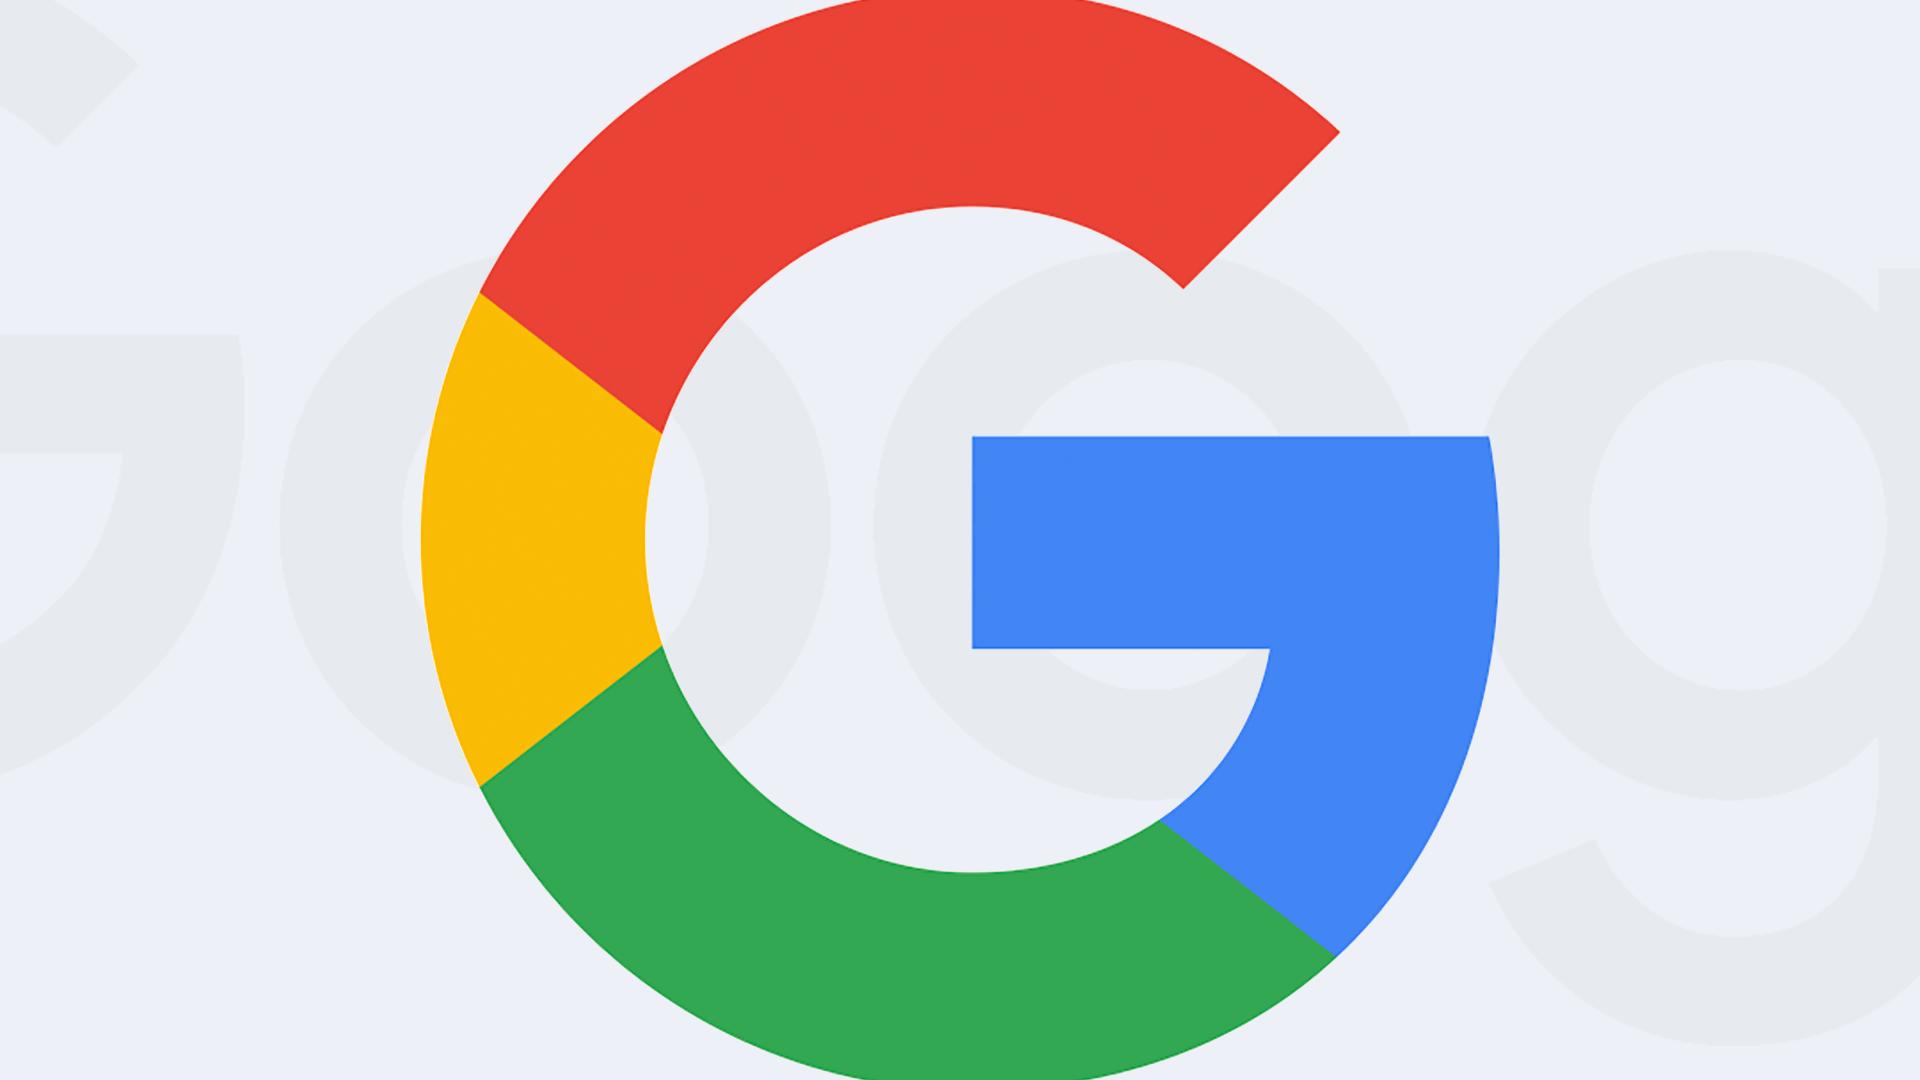 google-g-logo-2015-1920